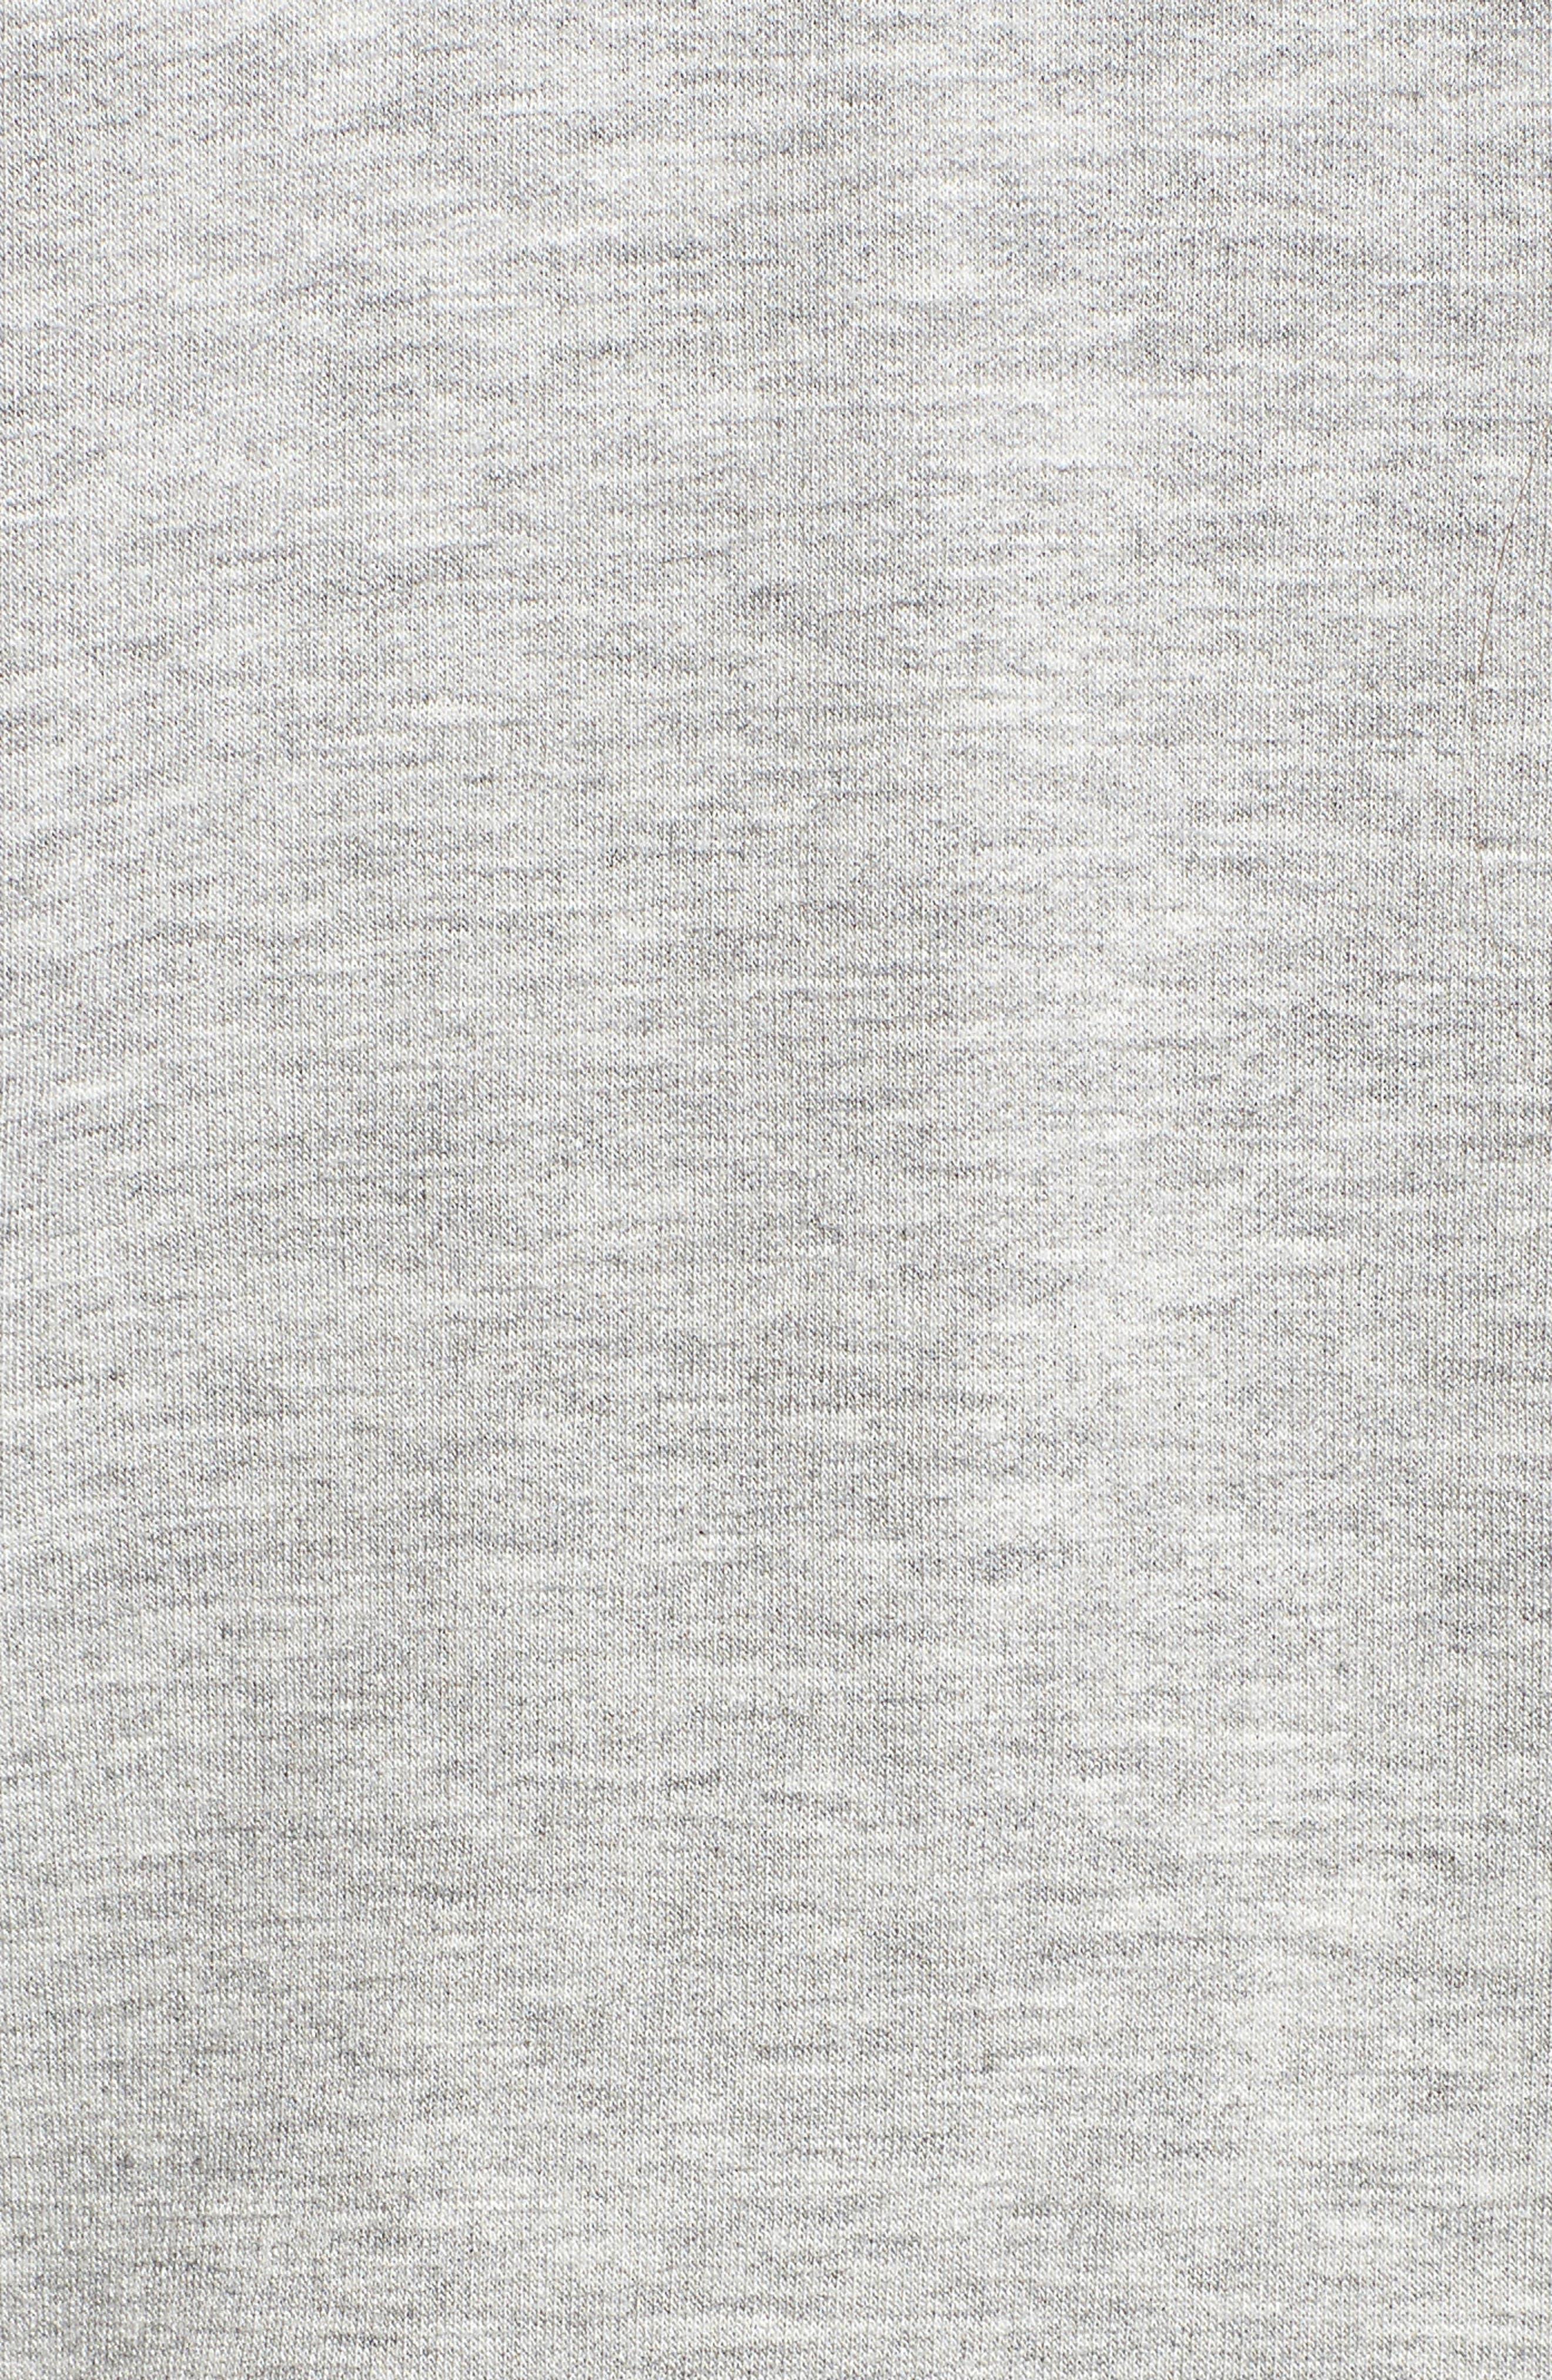 Off-Duty Fleece Knit Cardigan,                             Alternate thumbnail 5, color,                             Grey Heather